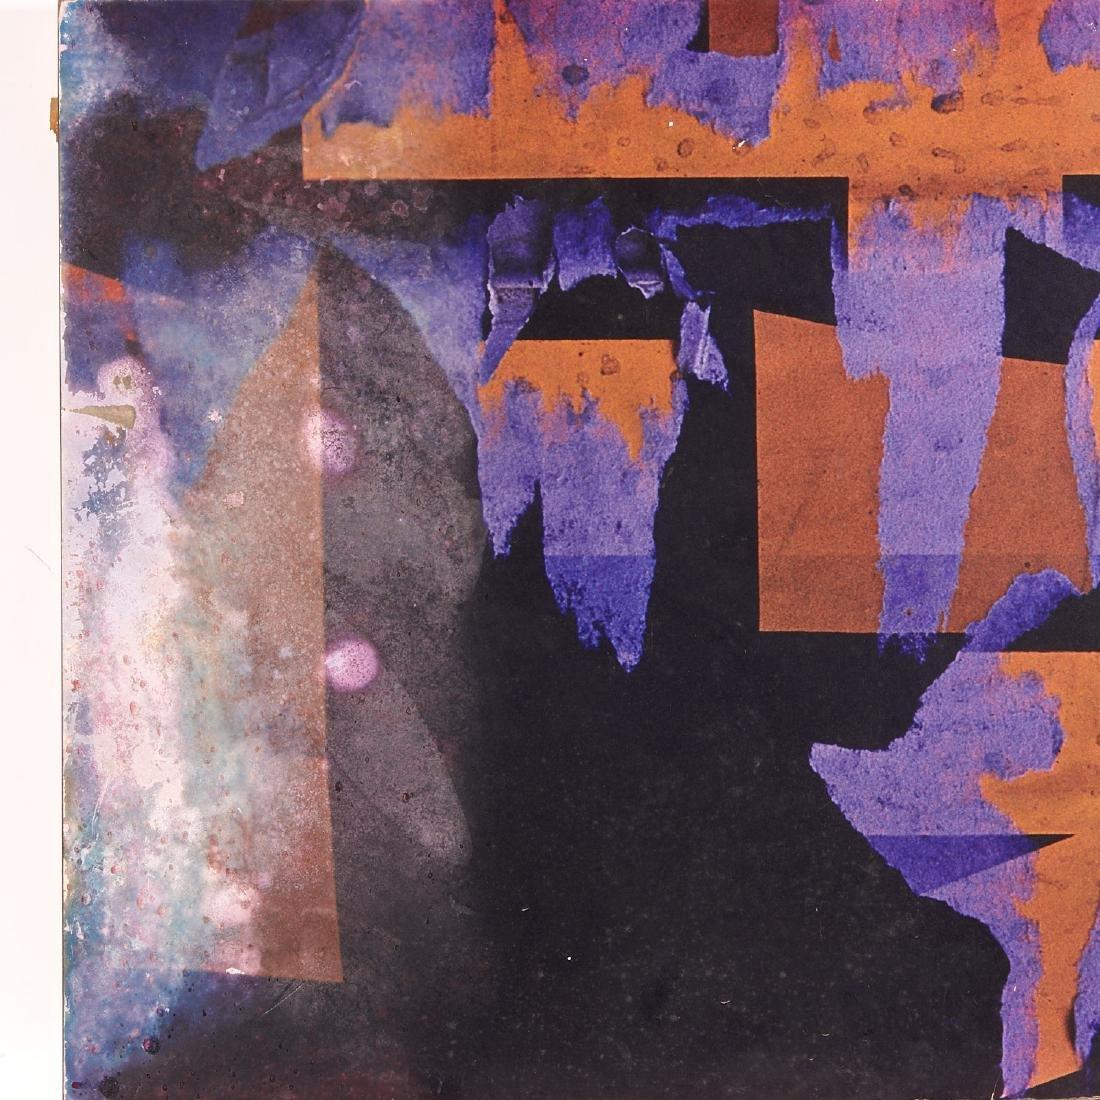 Ernst Haas, (2) Photographs, 1969 - 3